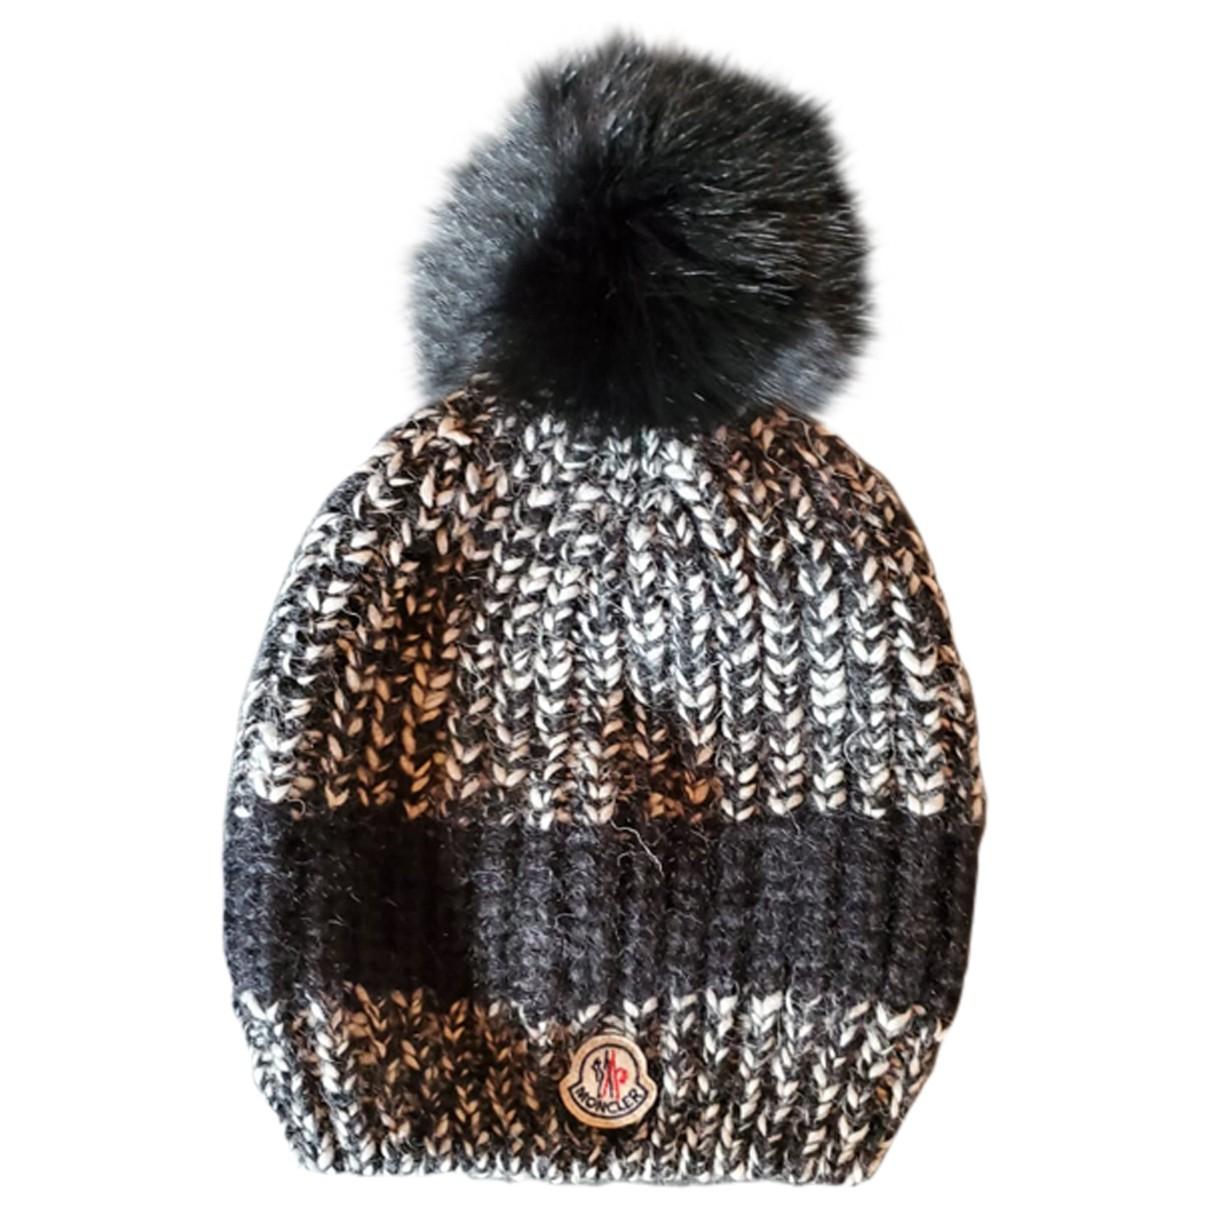 Moncler \N Black Wool hat for Women M International